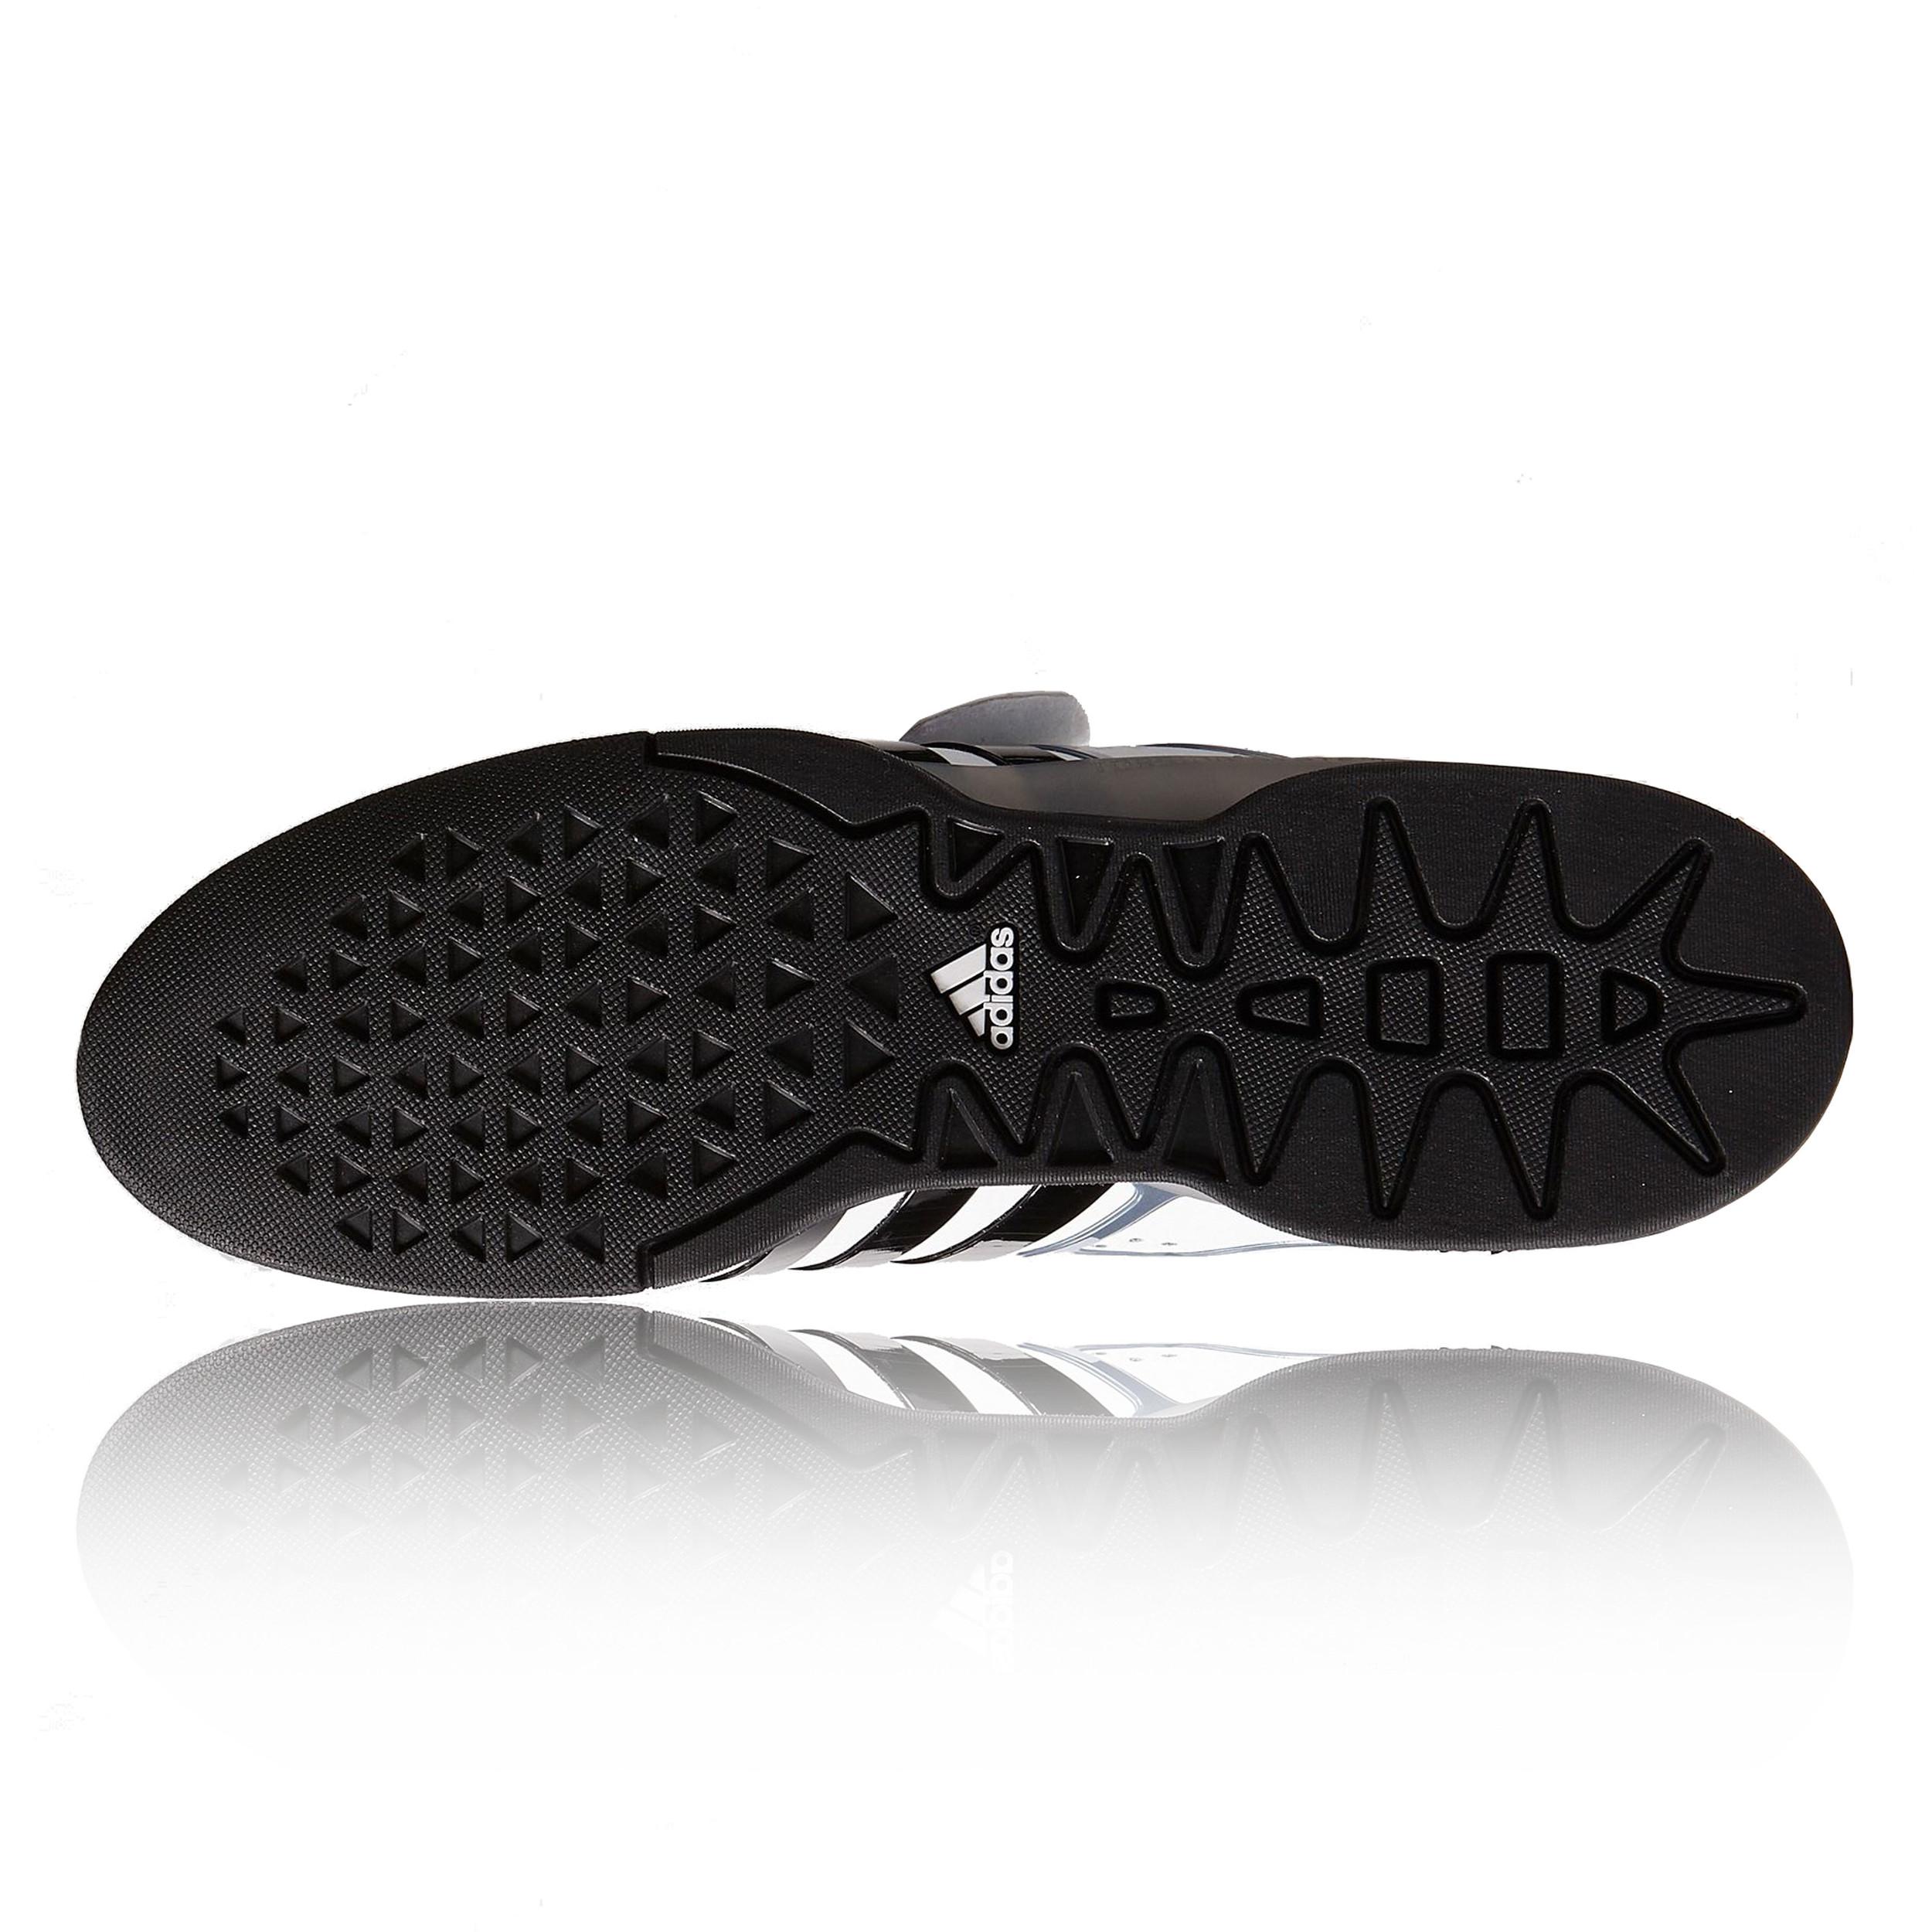 Adidas Adipower Shoes Australia